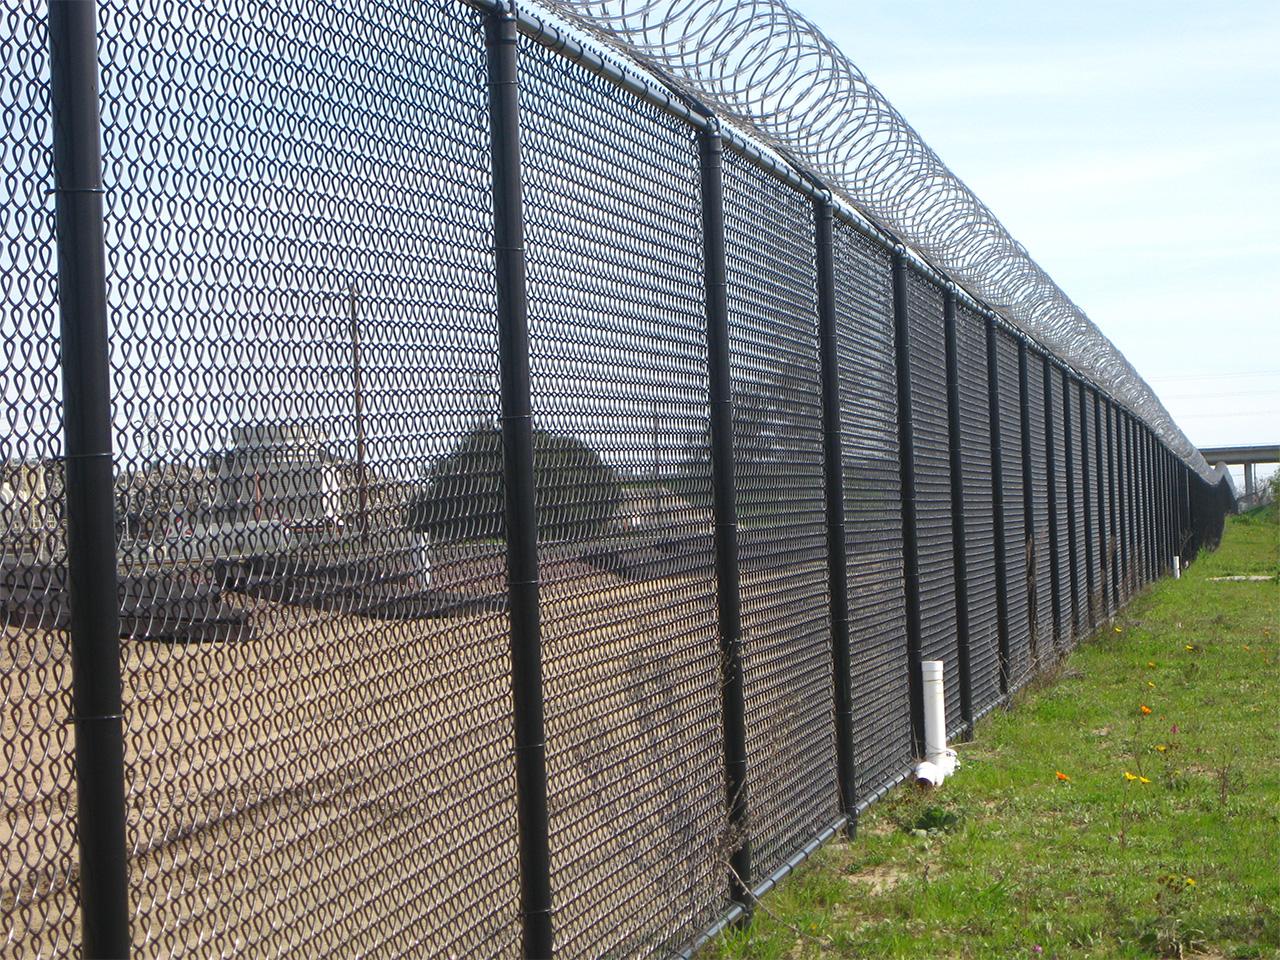 Chain Link Fence Portfolio -